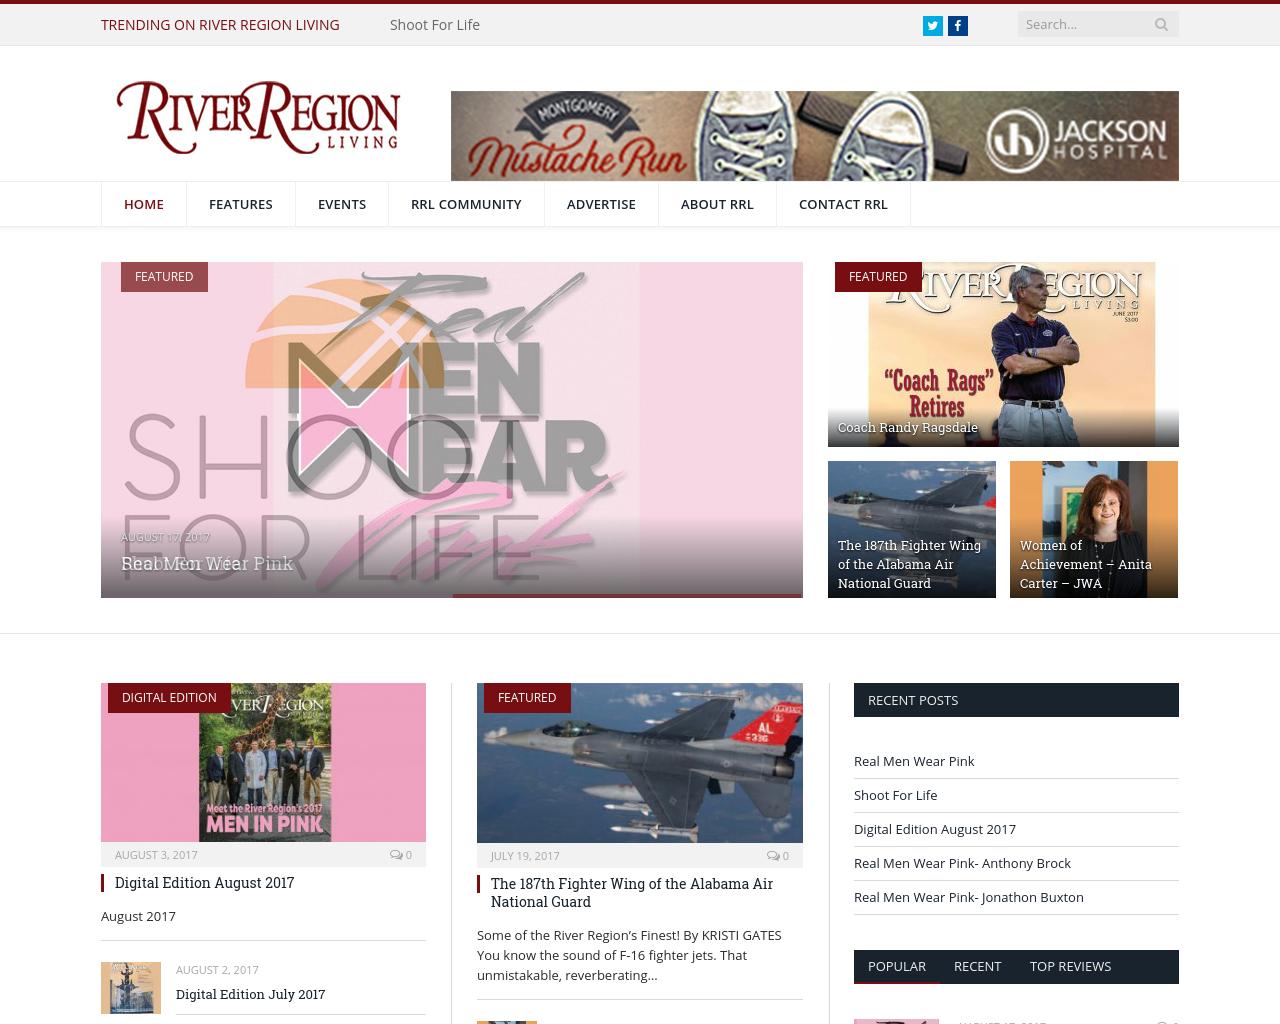 River-Region-Living-Advertising-Reviews-Pricing